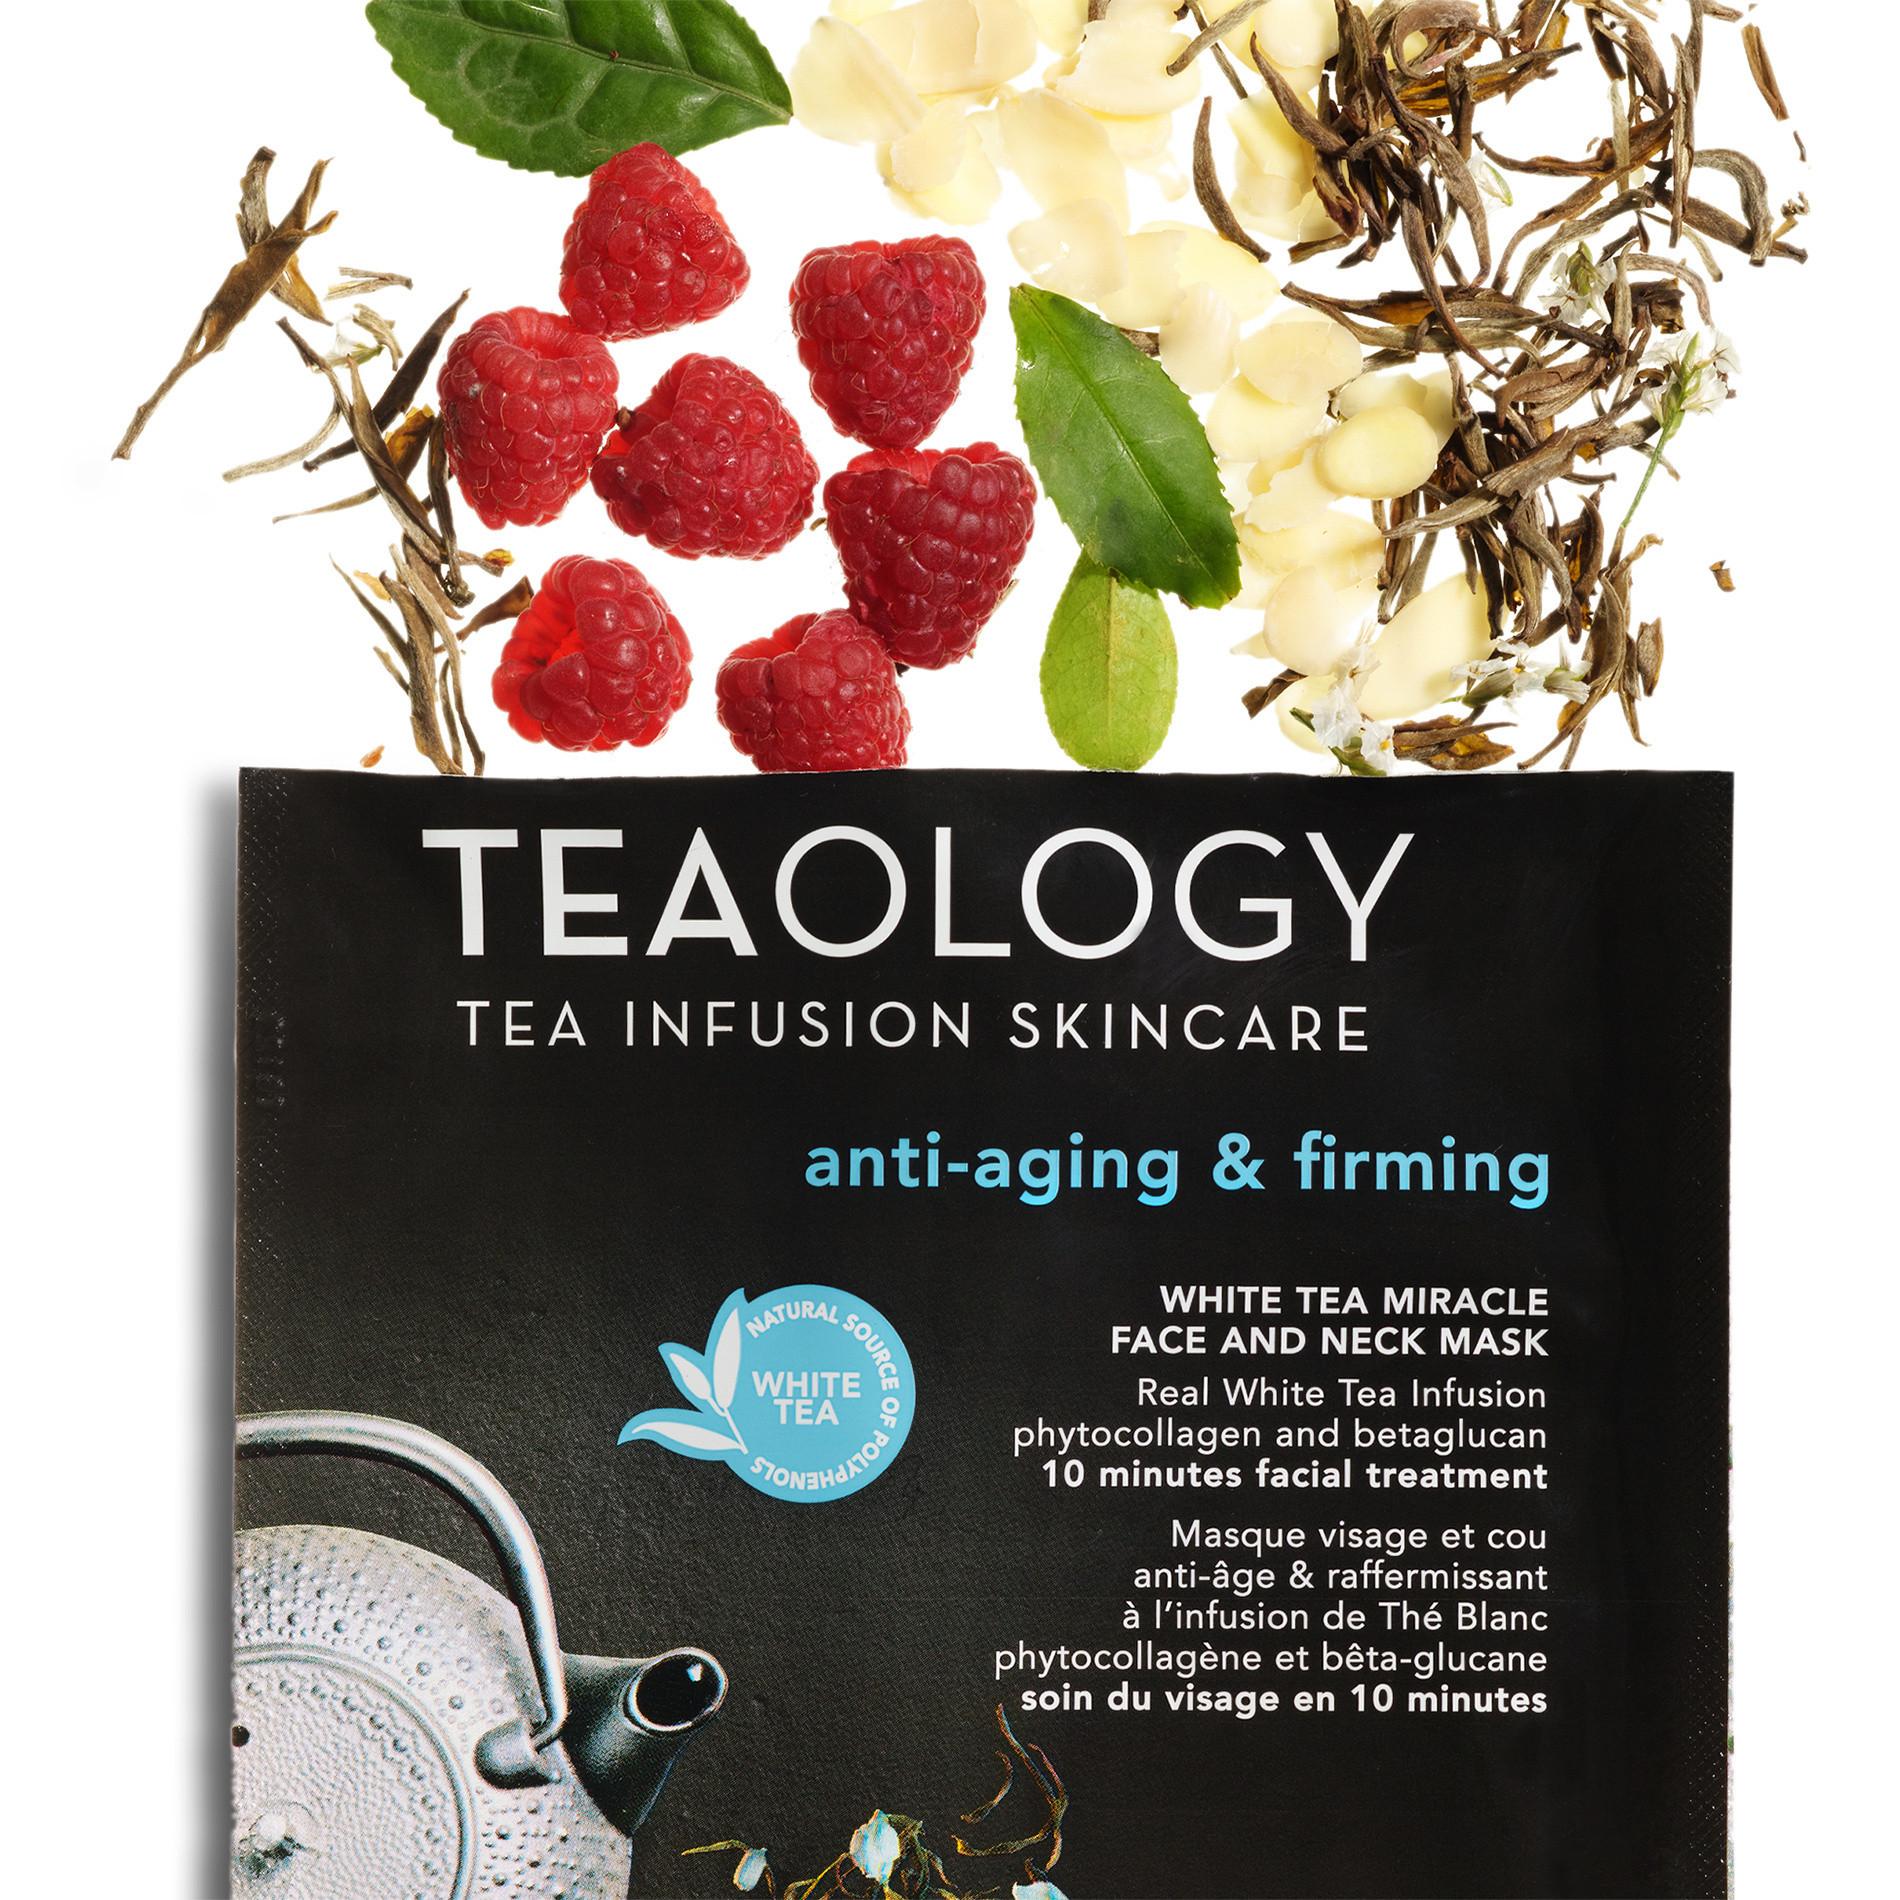 White Tea Miracle Maschera Viso e Collo Anti-aging  30 ml, Nero, large image number 2